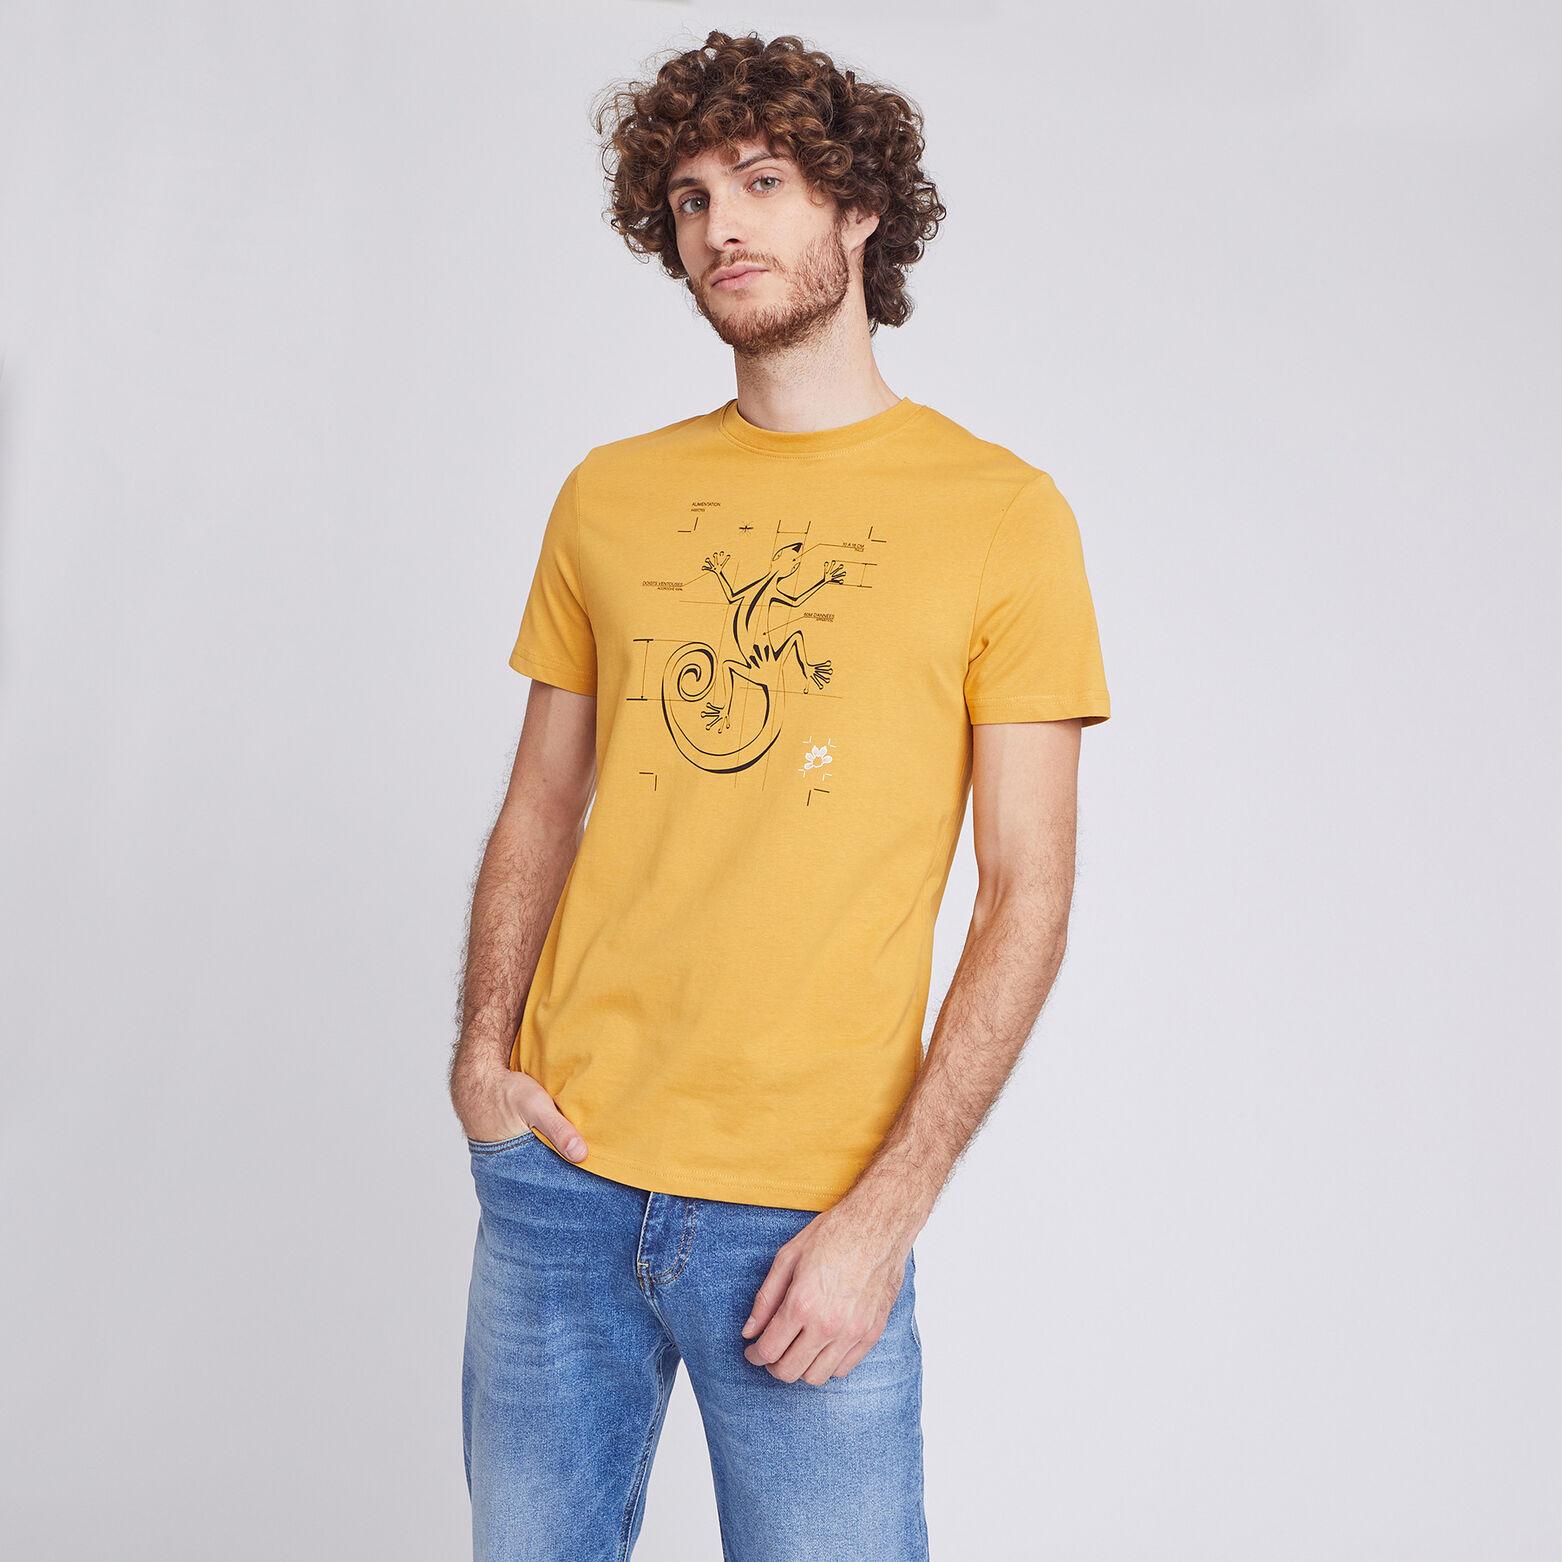 Tee shirt région LA RÉUNION